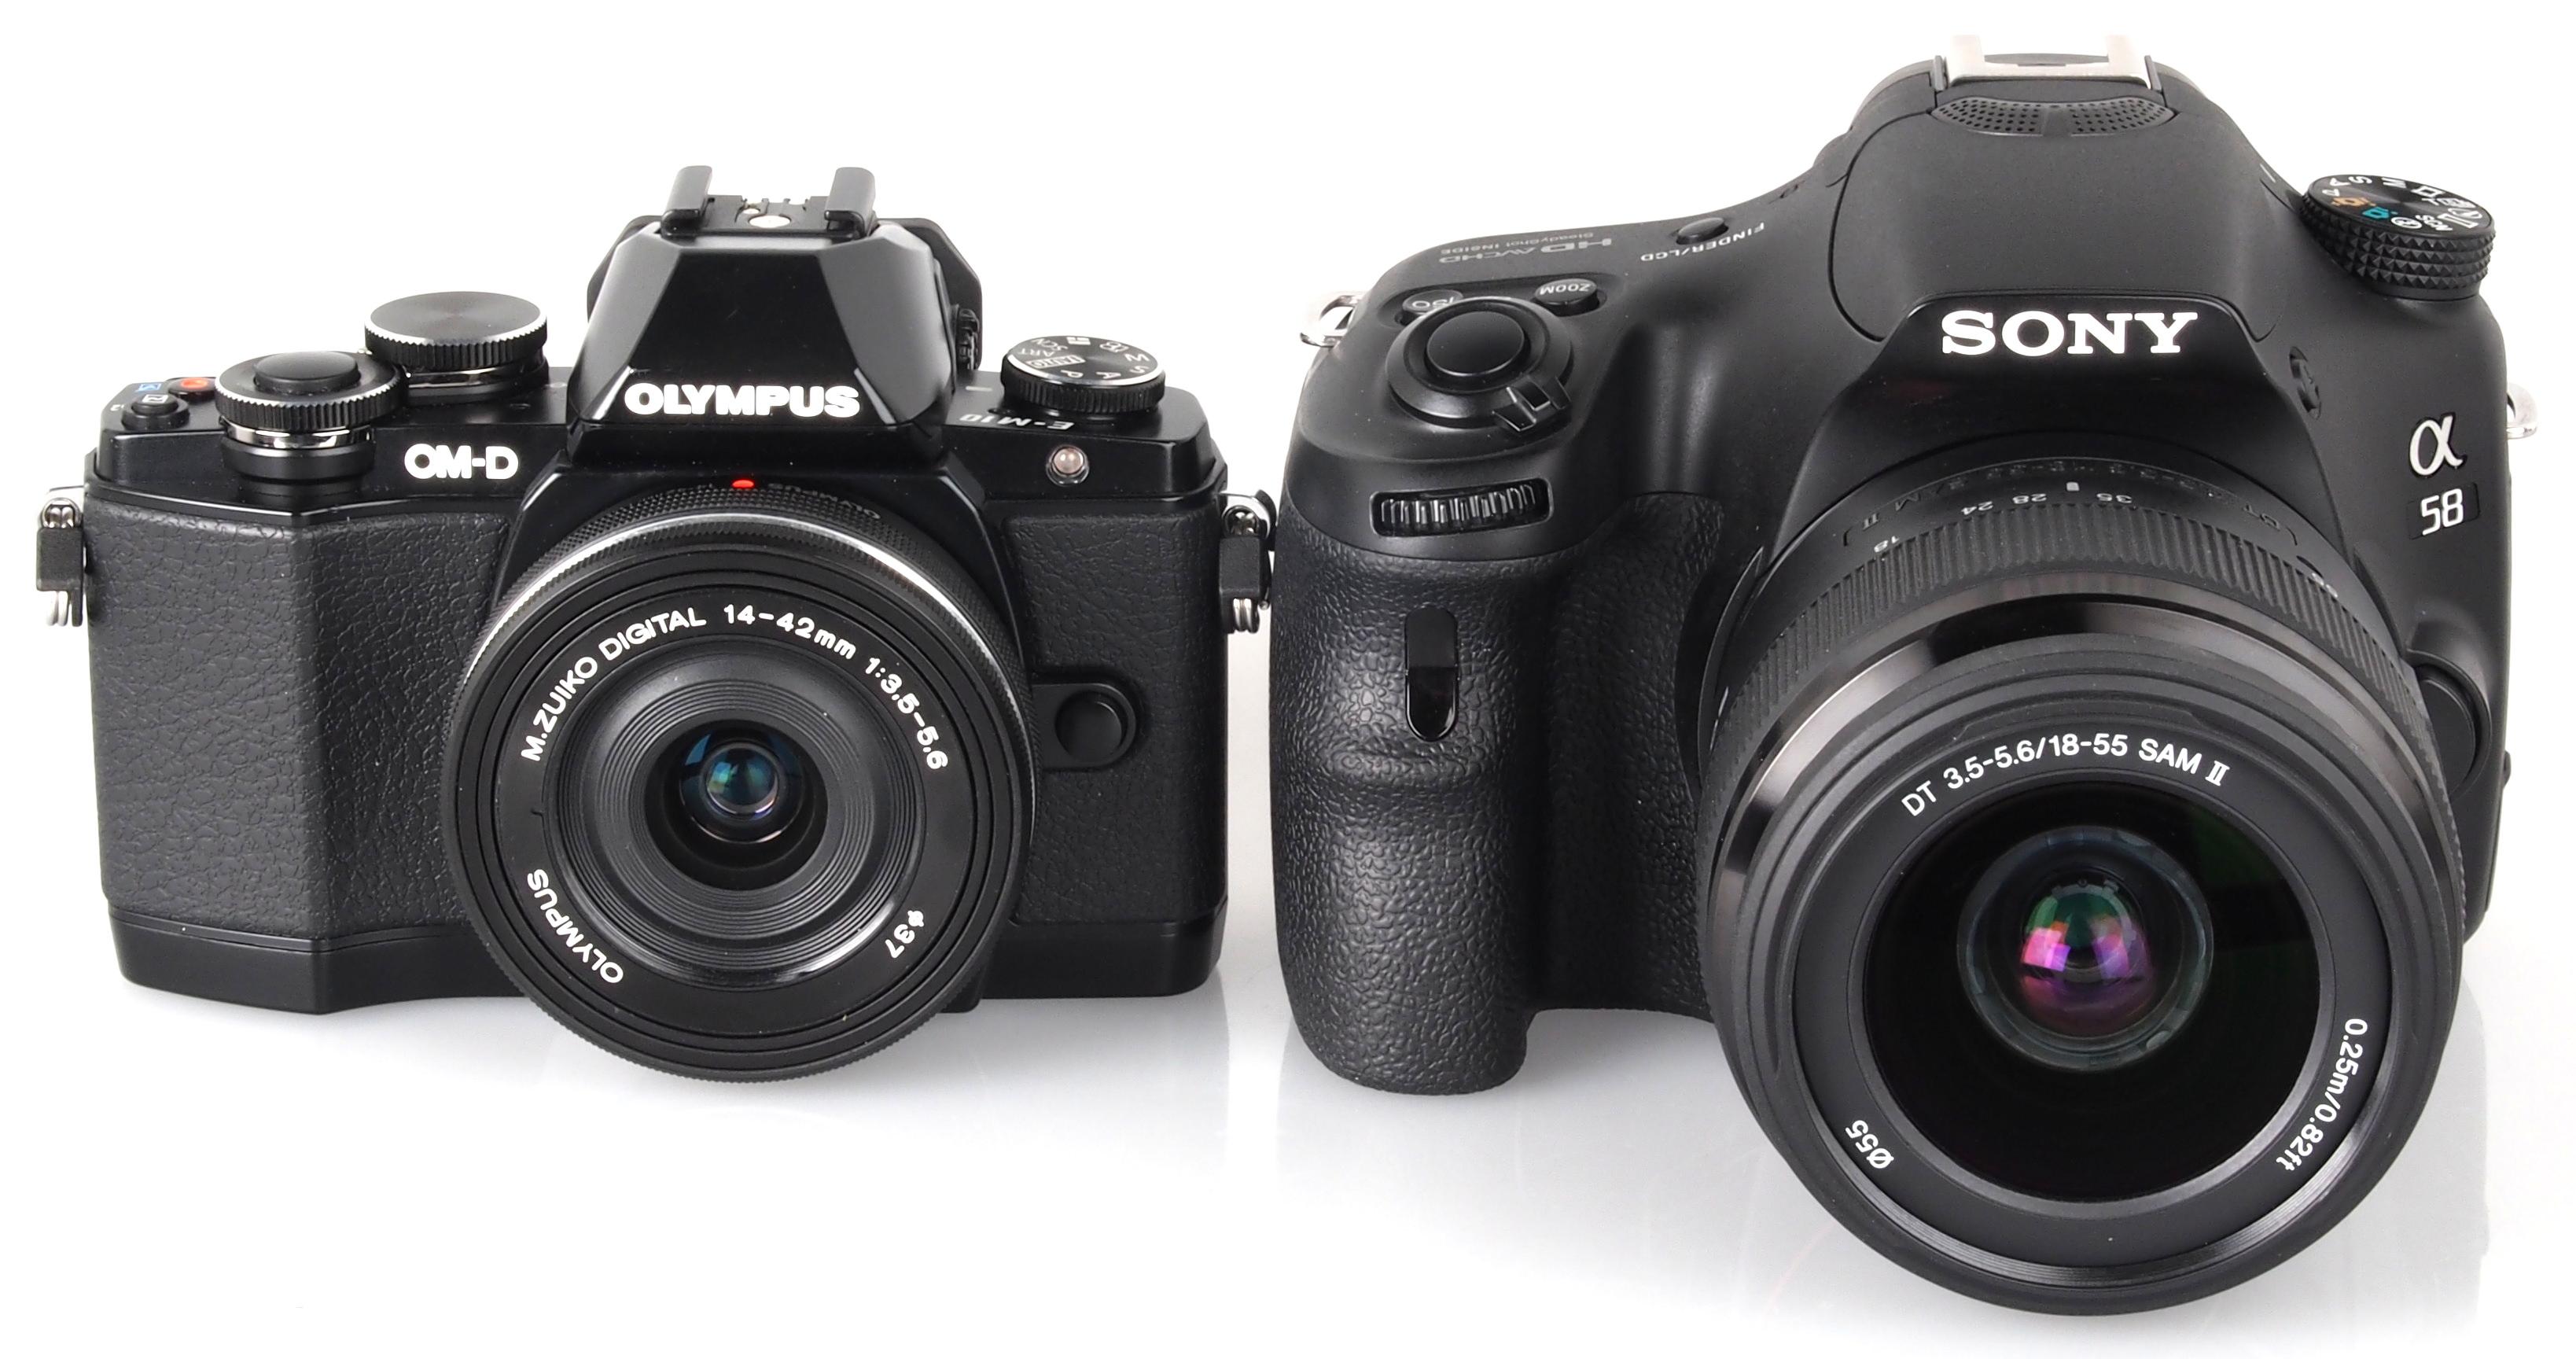 Camera Slt Camera Vs Dslr olympus om d e m10 mirrorless vs sony alpha a58 dslr 14